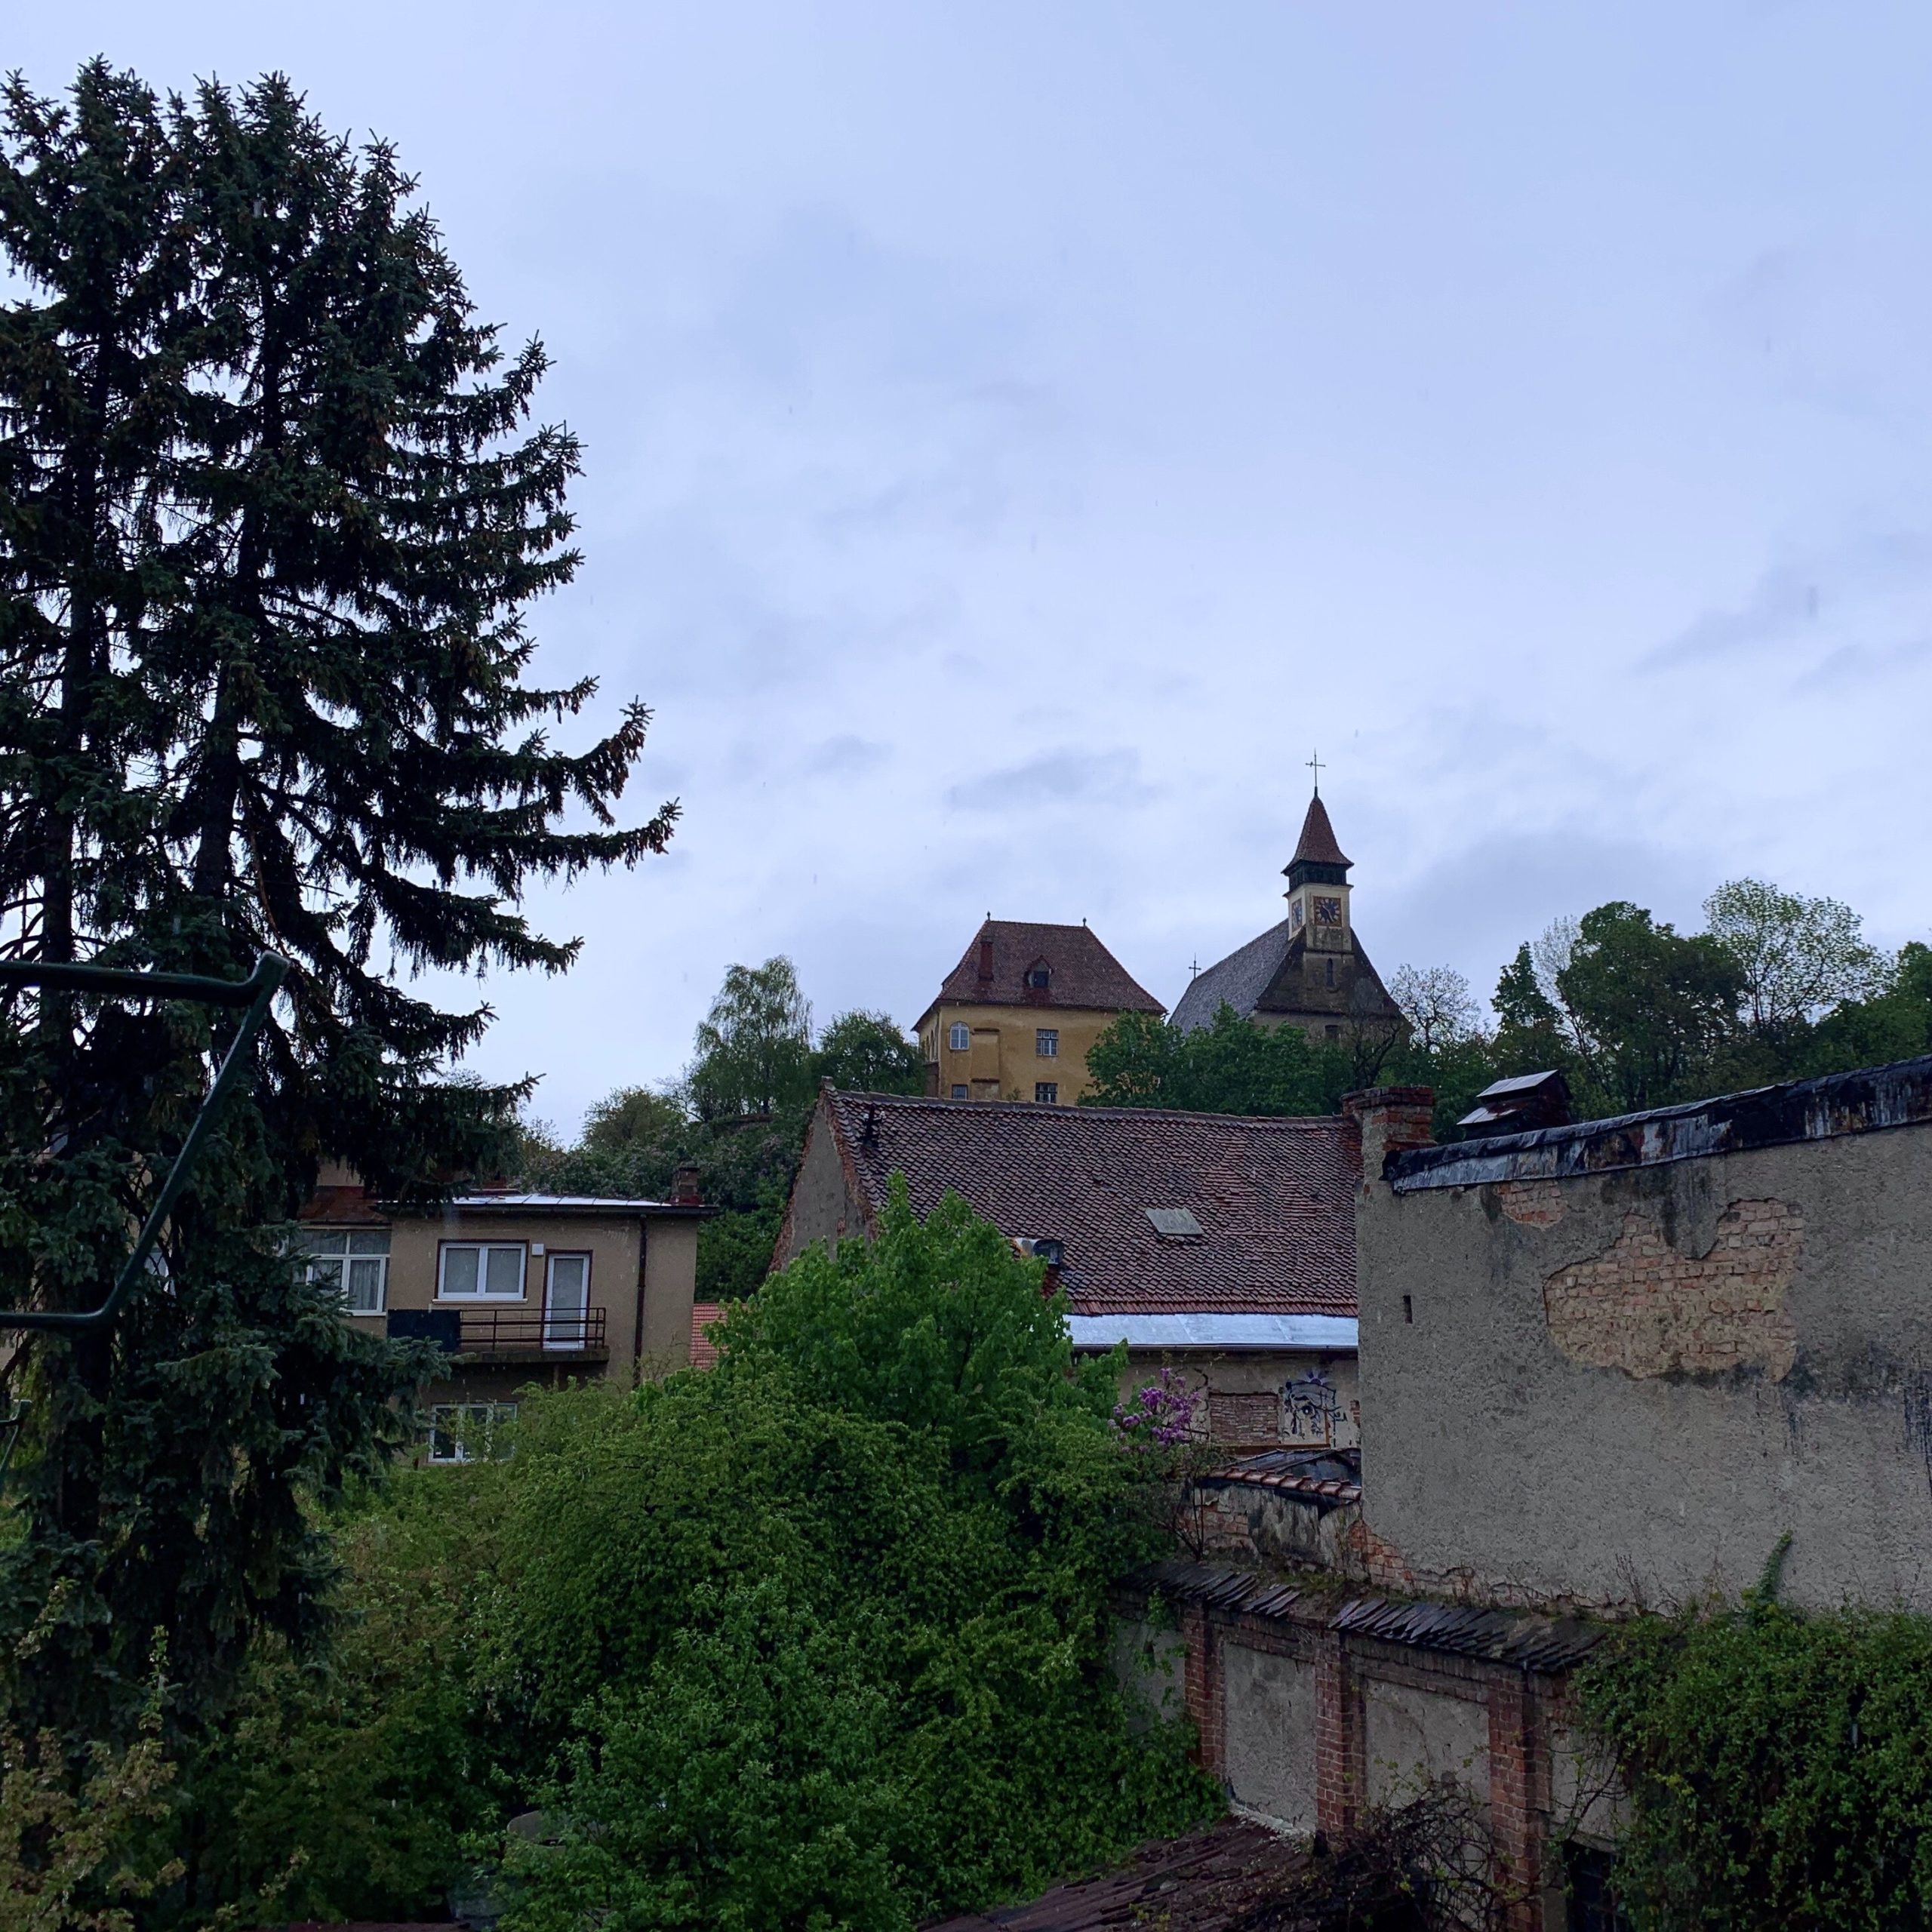 Rainstorm, Brașov, Romania on 3rd May 2020 at 6.33pm – by Stefania Cotei